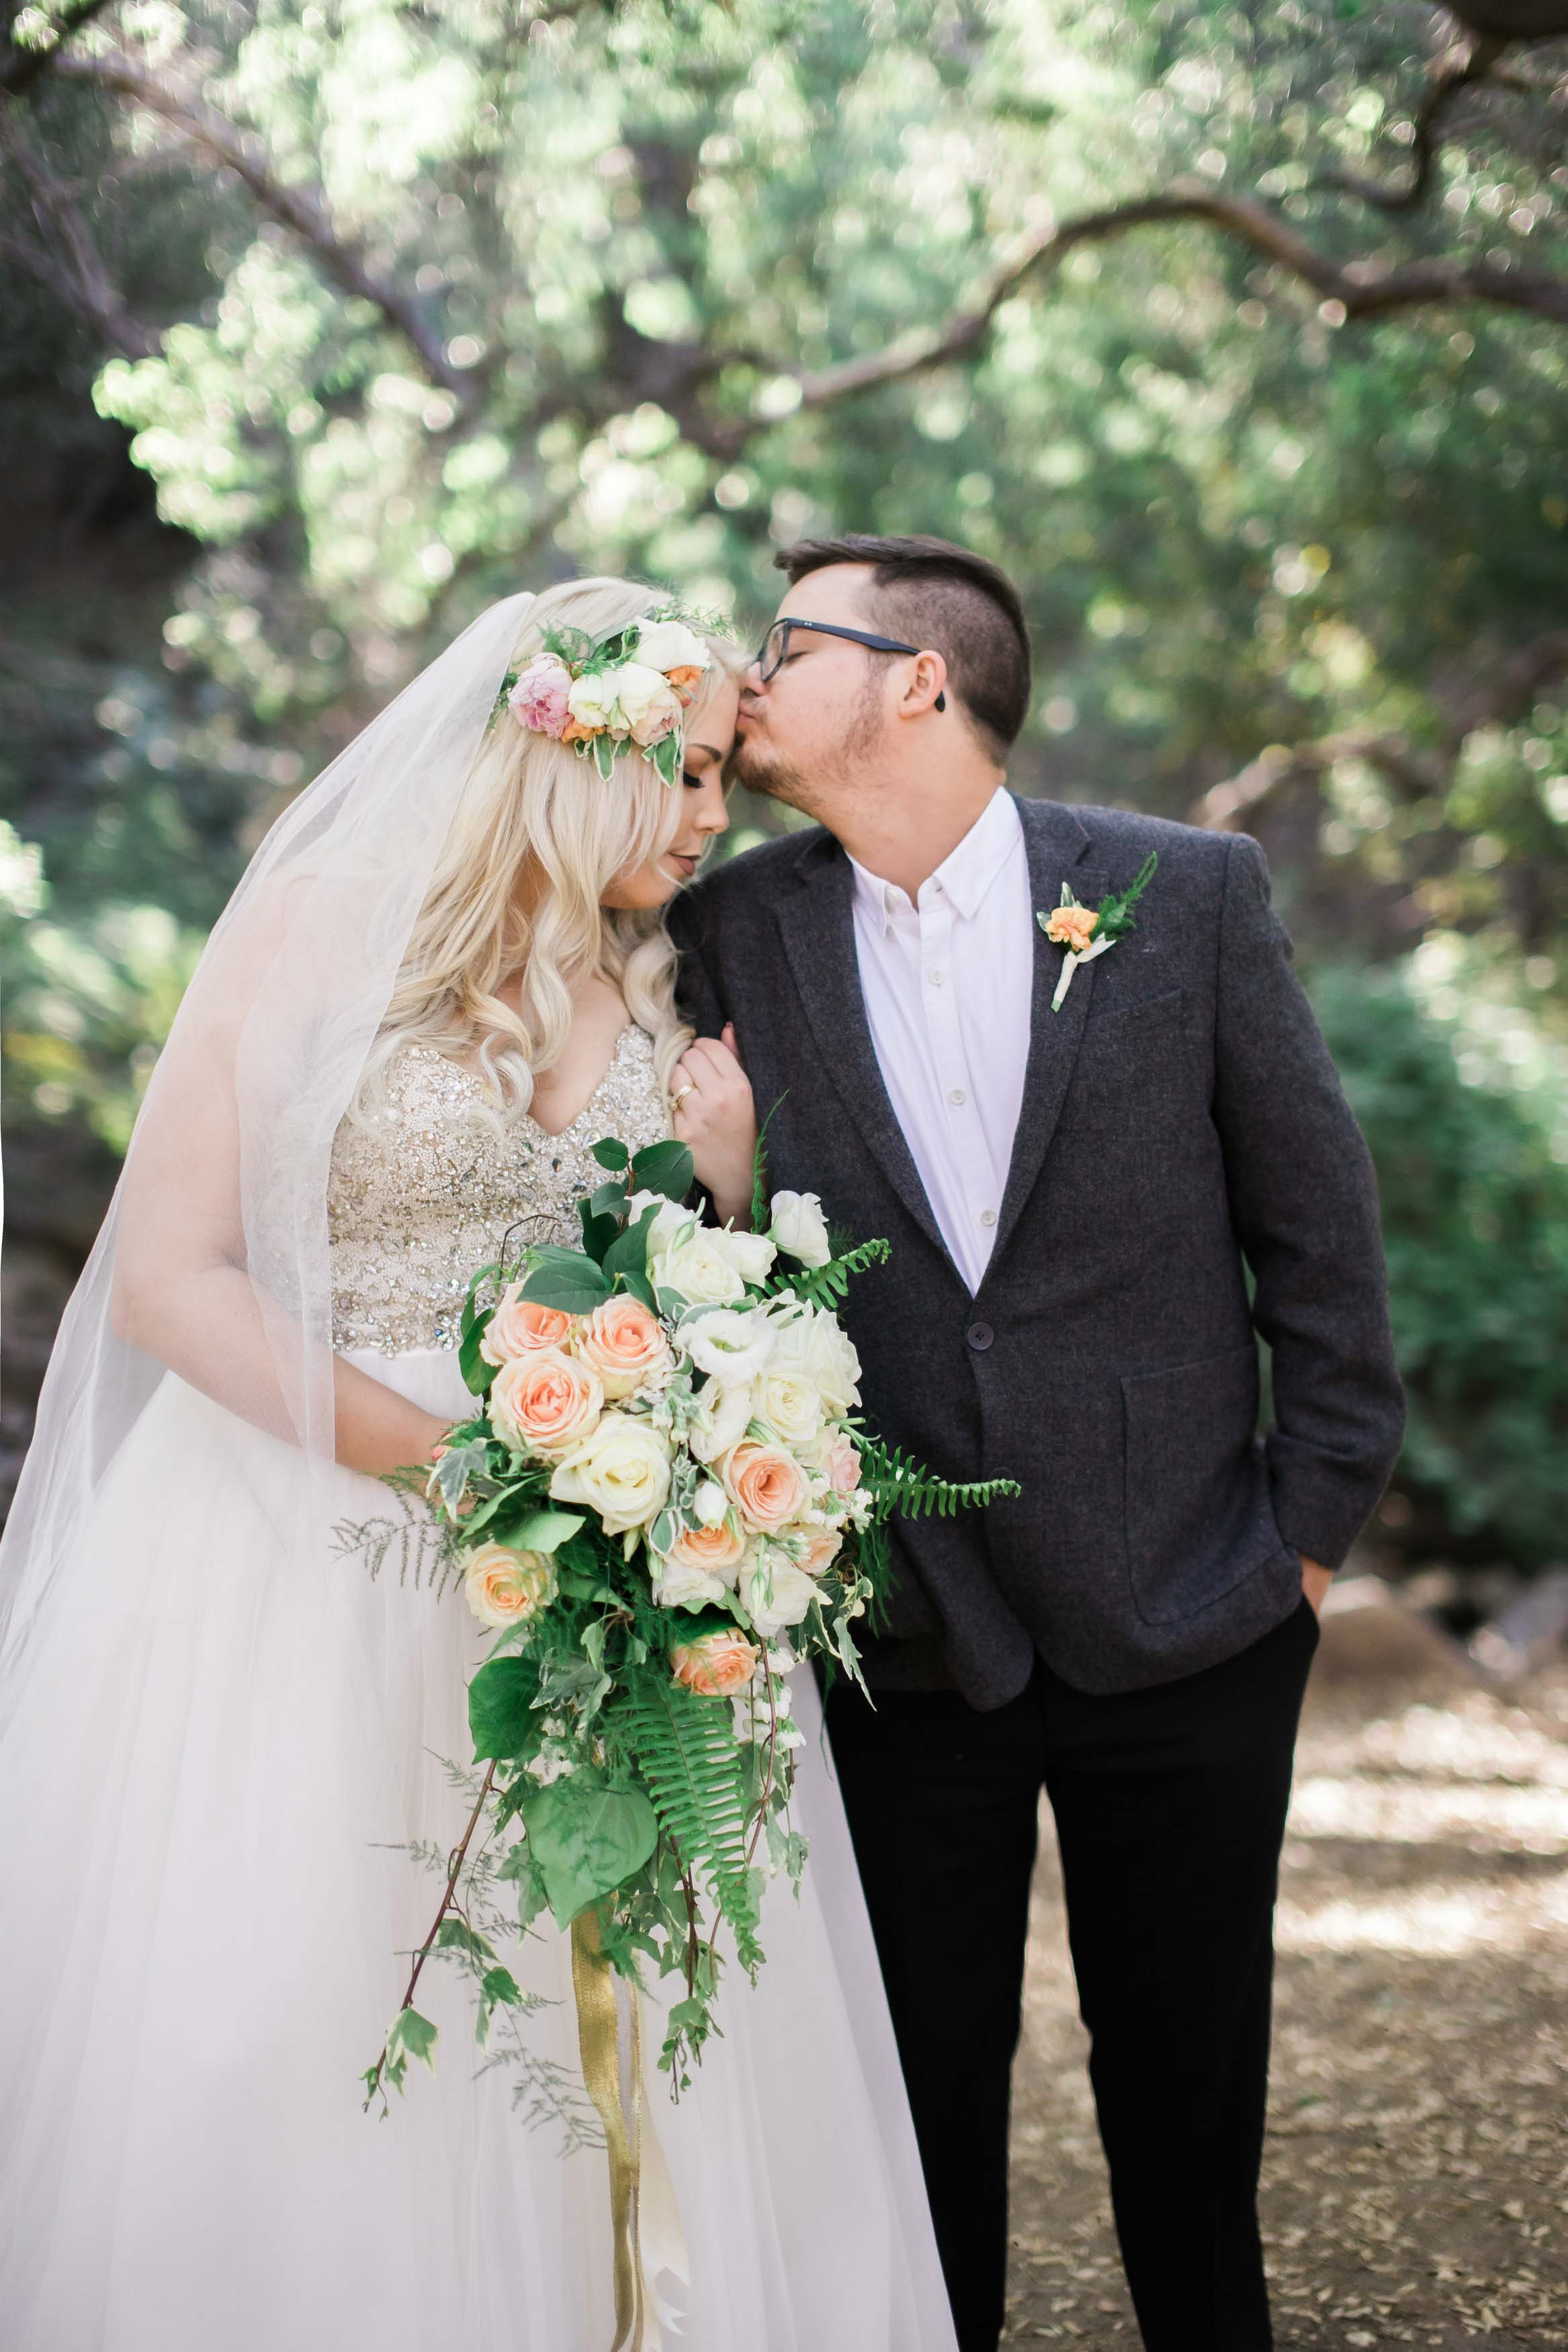 Kiara_and_Corbin_WEDDING_ Brienne_Michelle_Photography_061.JPG